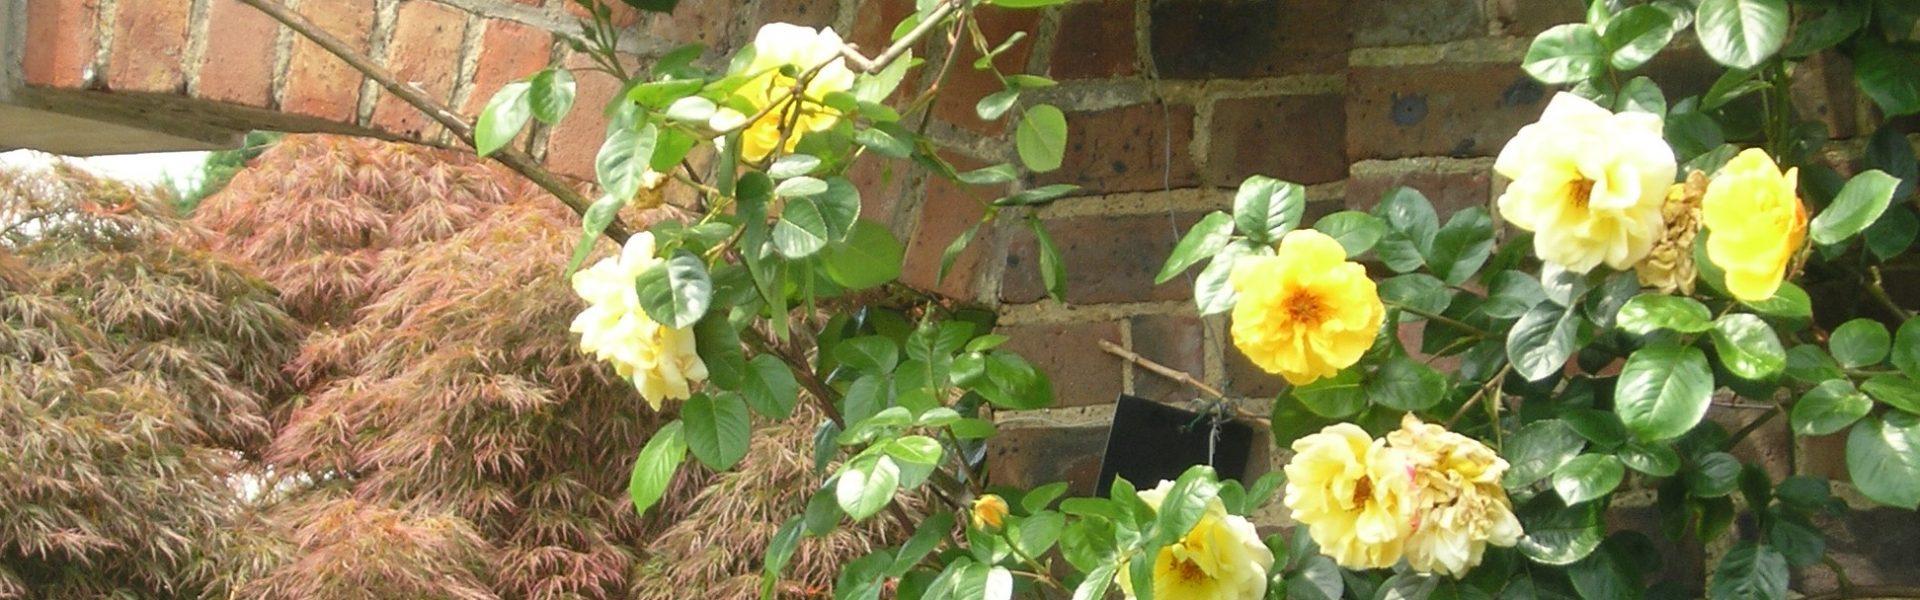 Klatrende planter – skap din oase